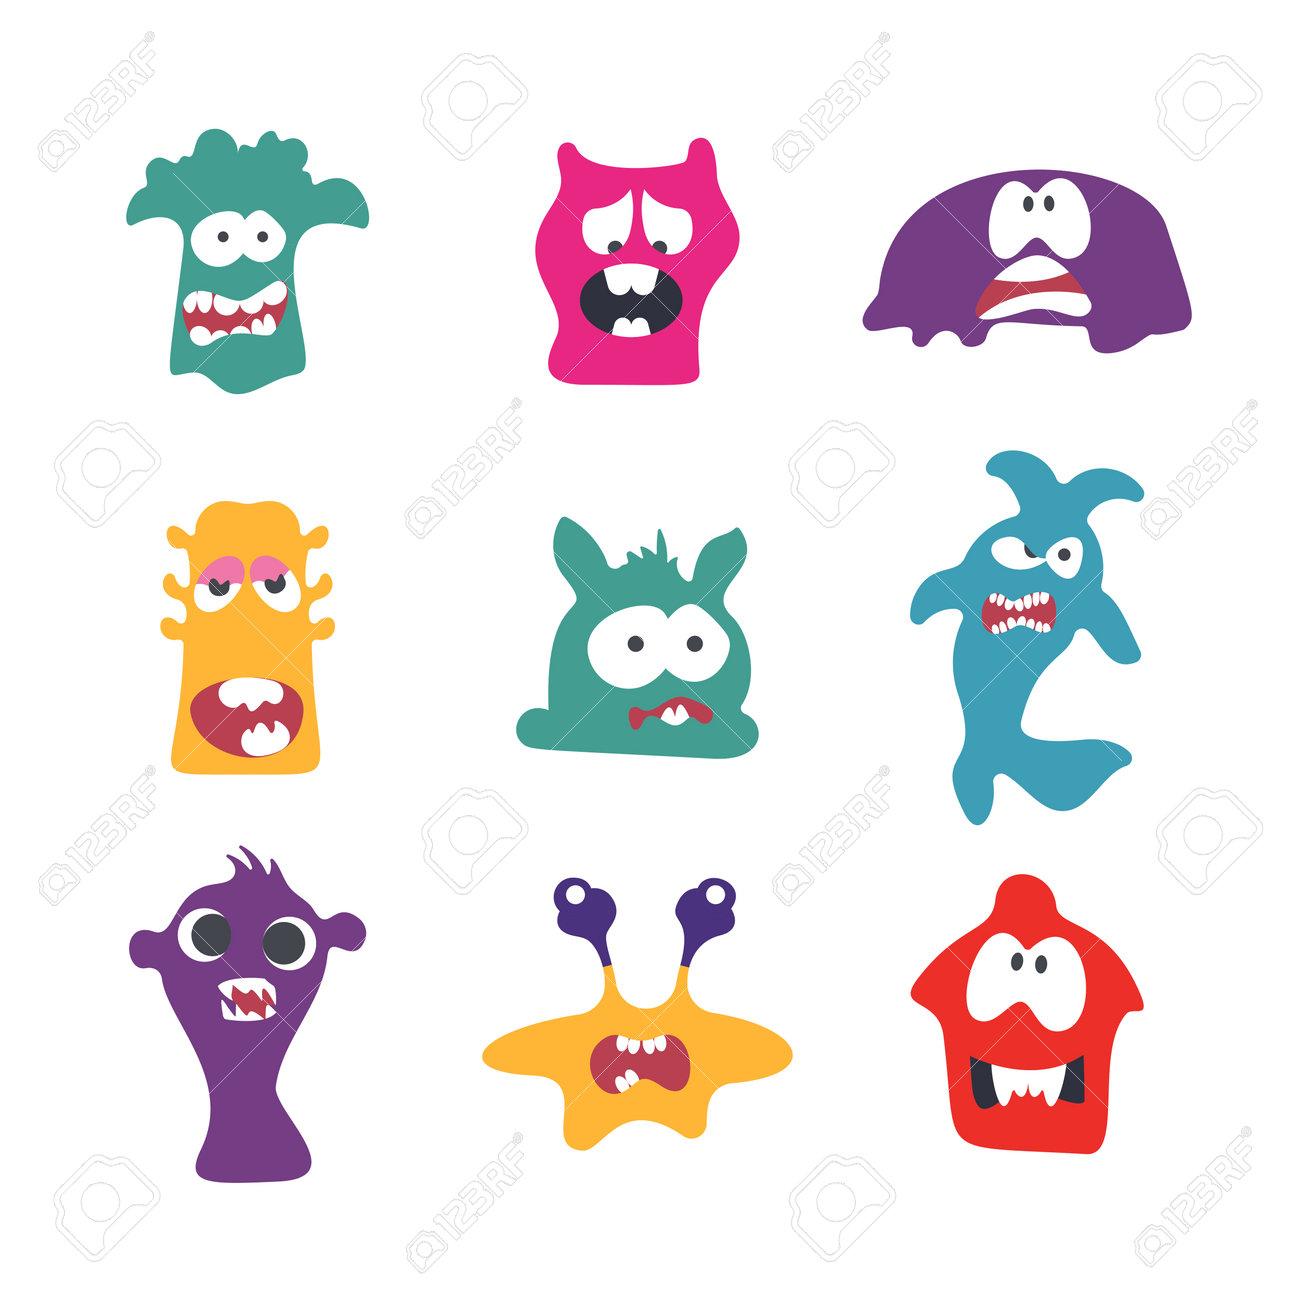 Cute Cartoon Monsters illustration. Flat vector collection. Collection of cute, colorful cartoon monsters. Vector illustration. Flat design. - 166596784